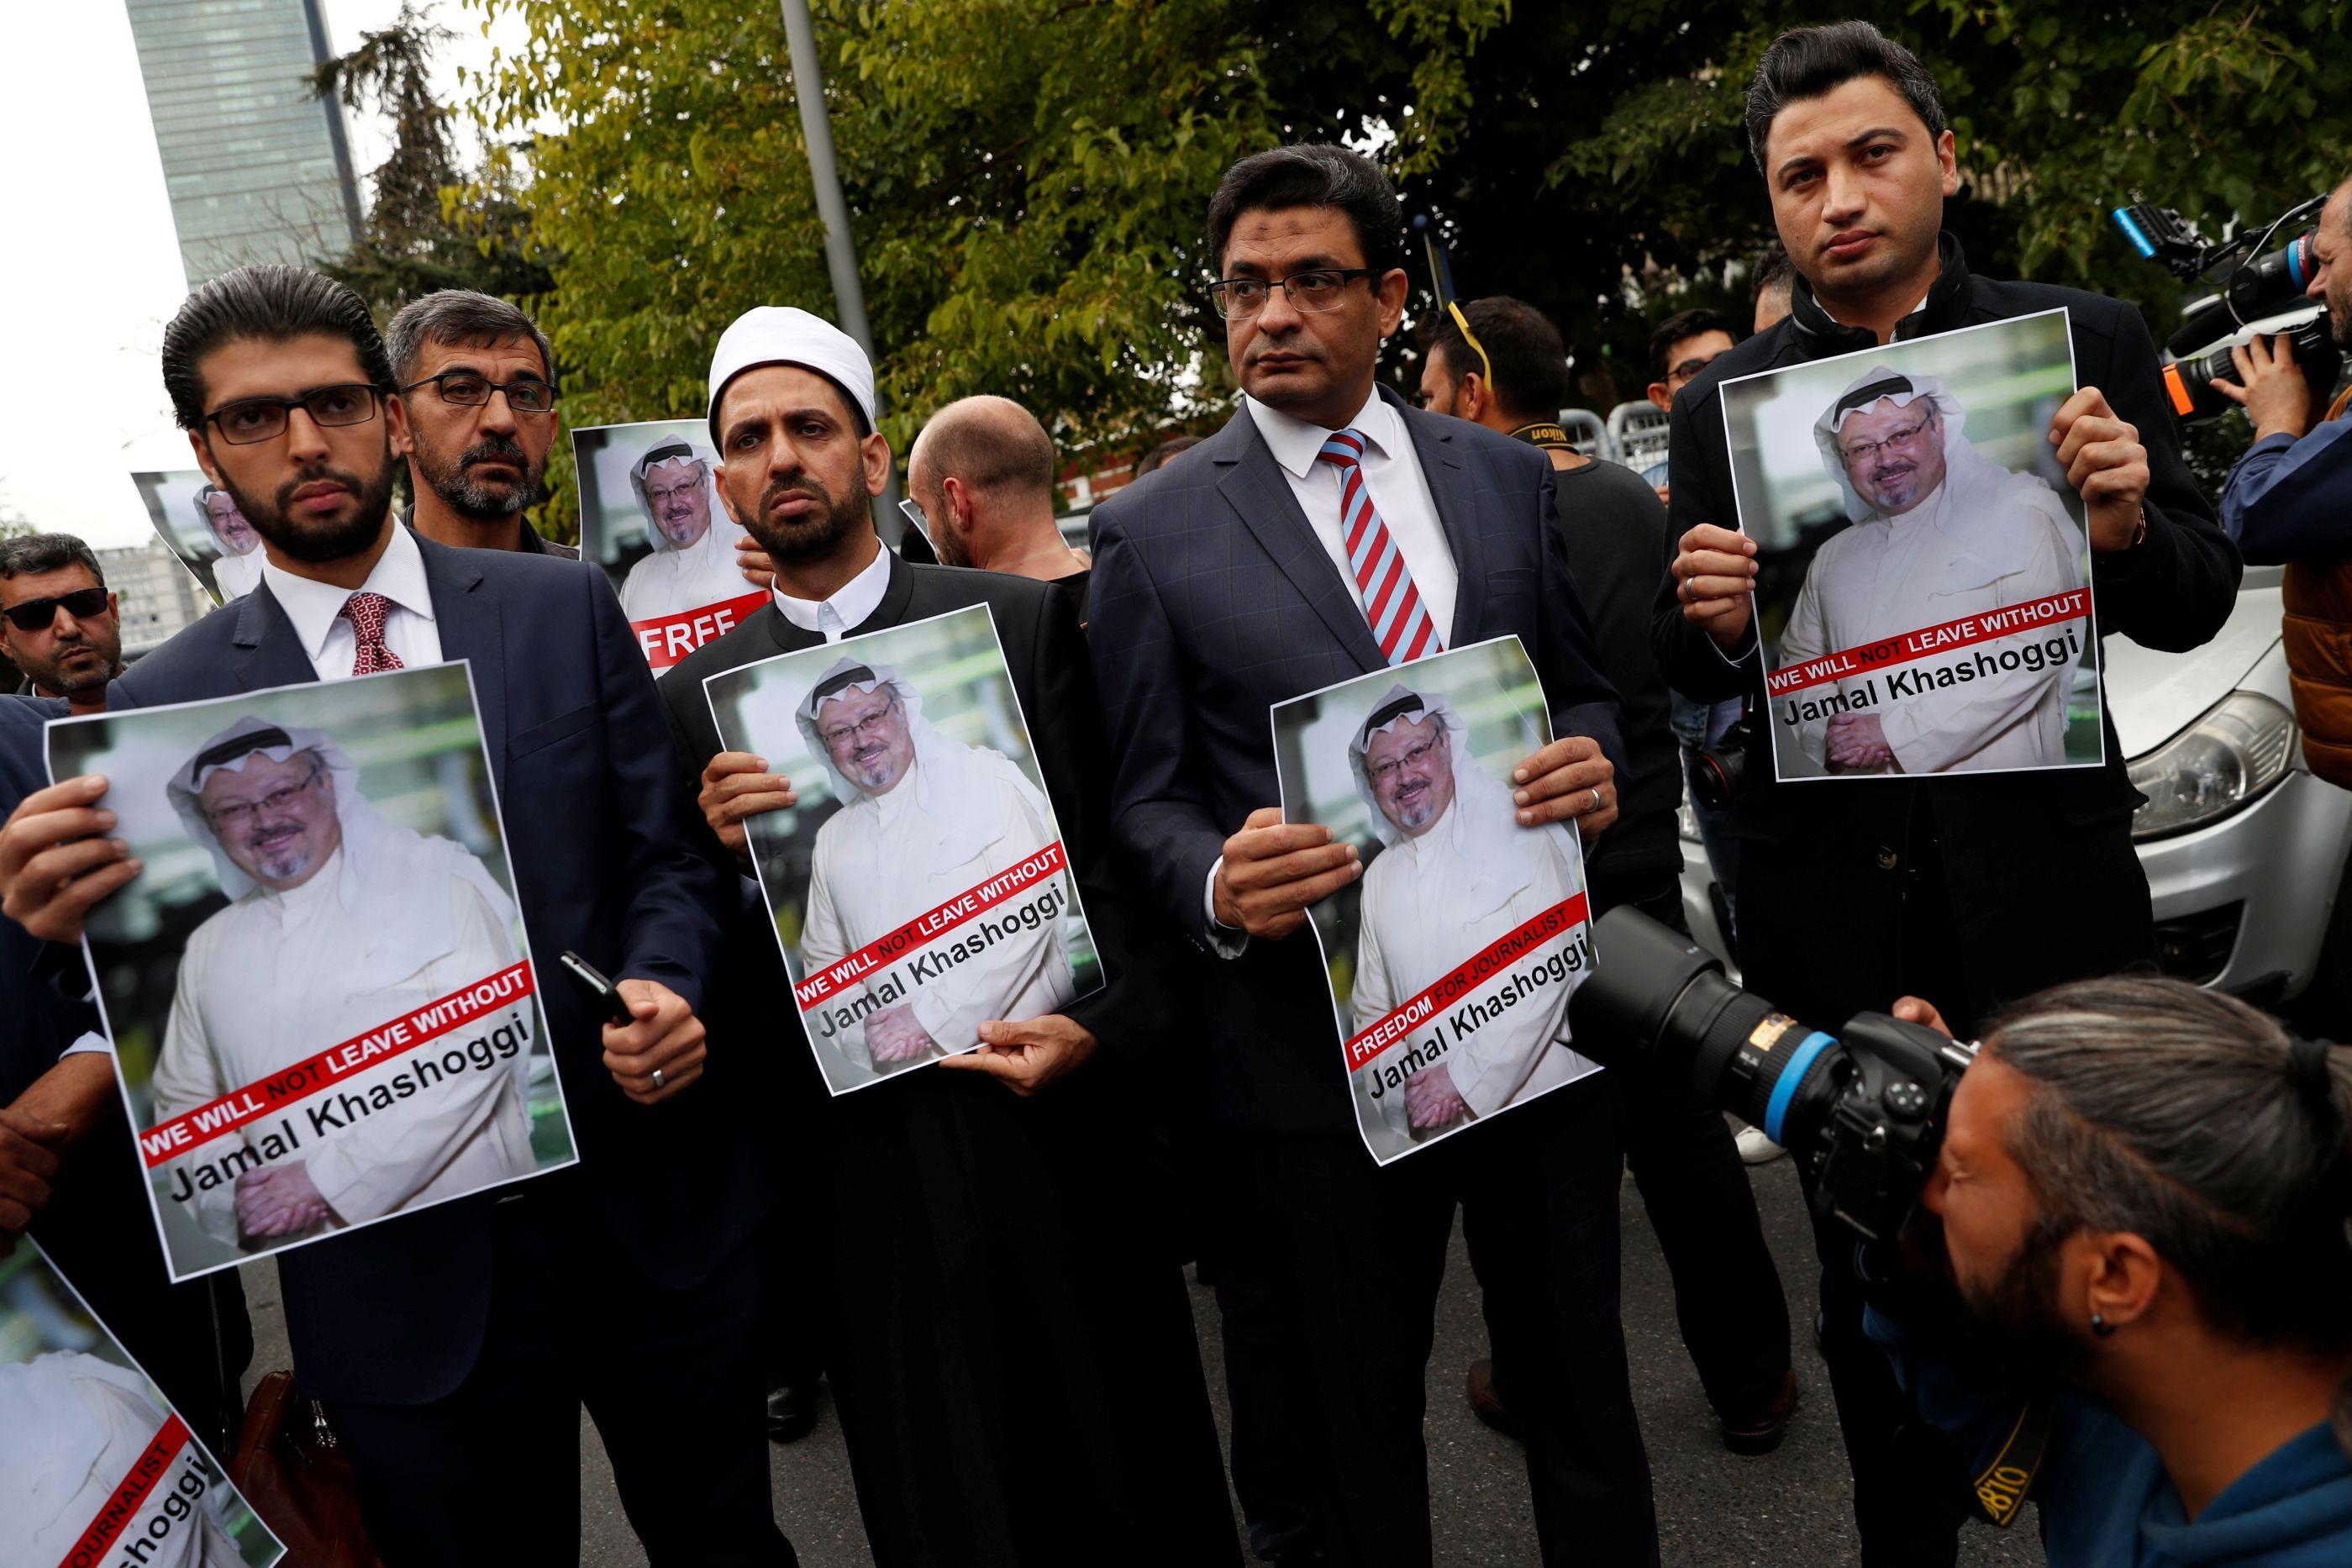 Apple Watch de jornalista saudita terá registos de tortura e morte